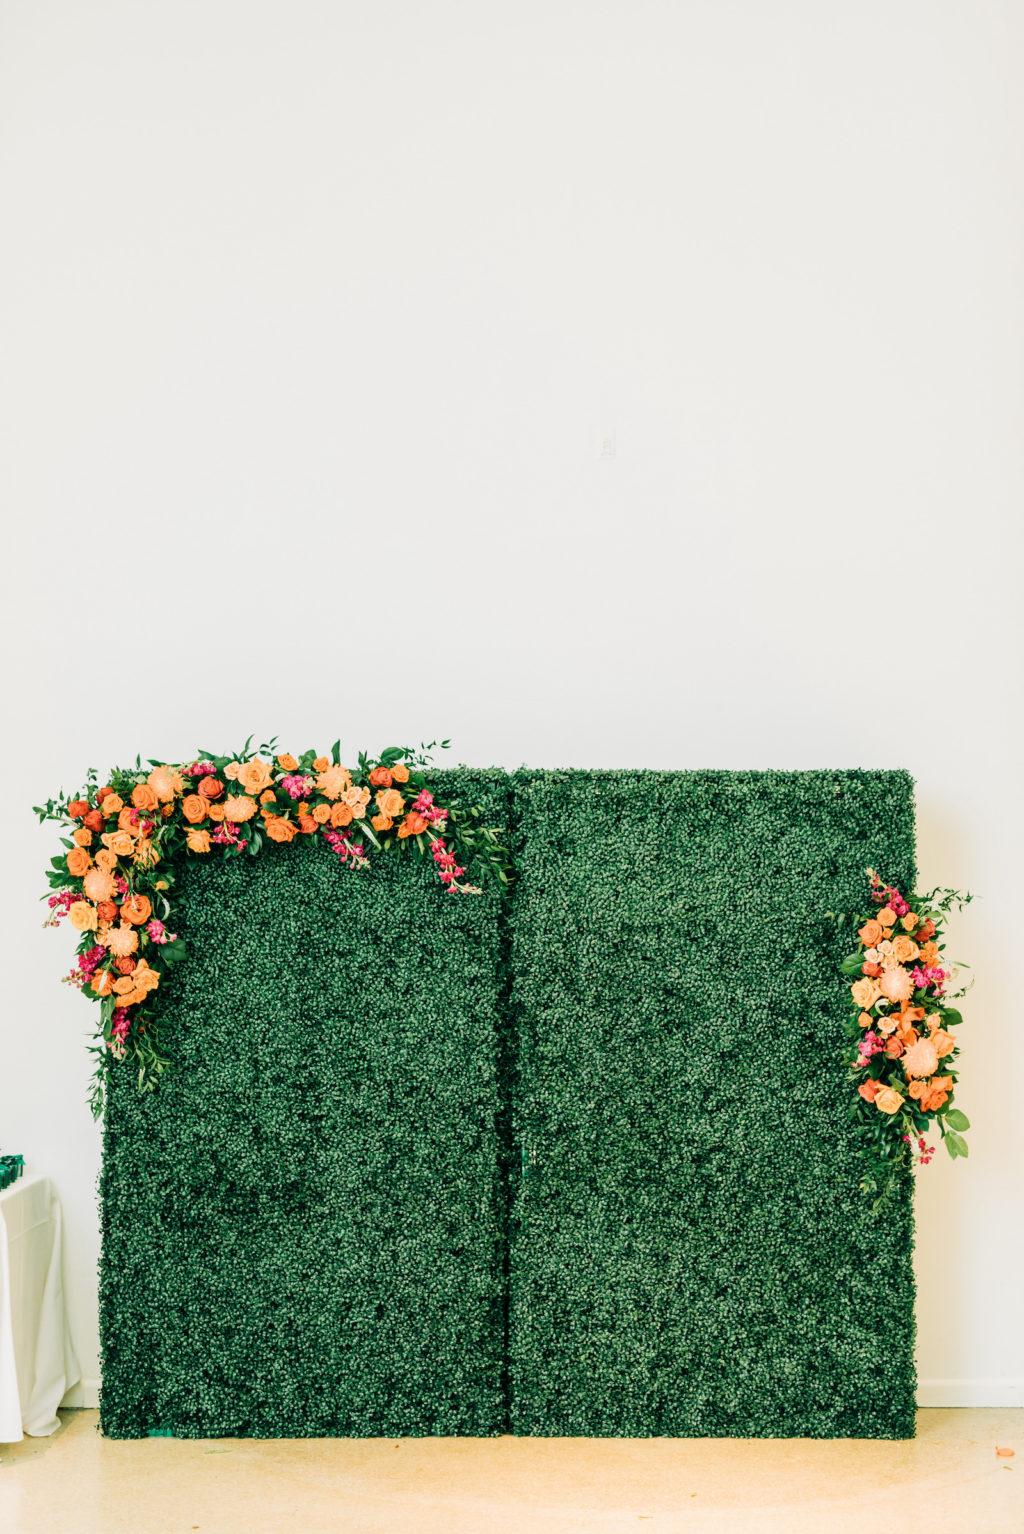 Garden Wedding Reception Decor, Greenery Hedge Backdrop with Vibrant Colorful Pink, Orange Lush Floral Arrangements   Tampa Bay Wedding Florist Monarch Events and Design   Wedding Rentals Kate Ryan Event Rentals